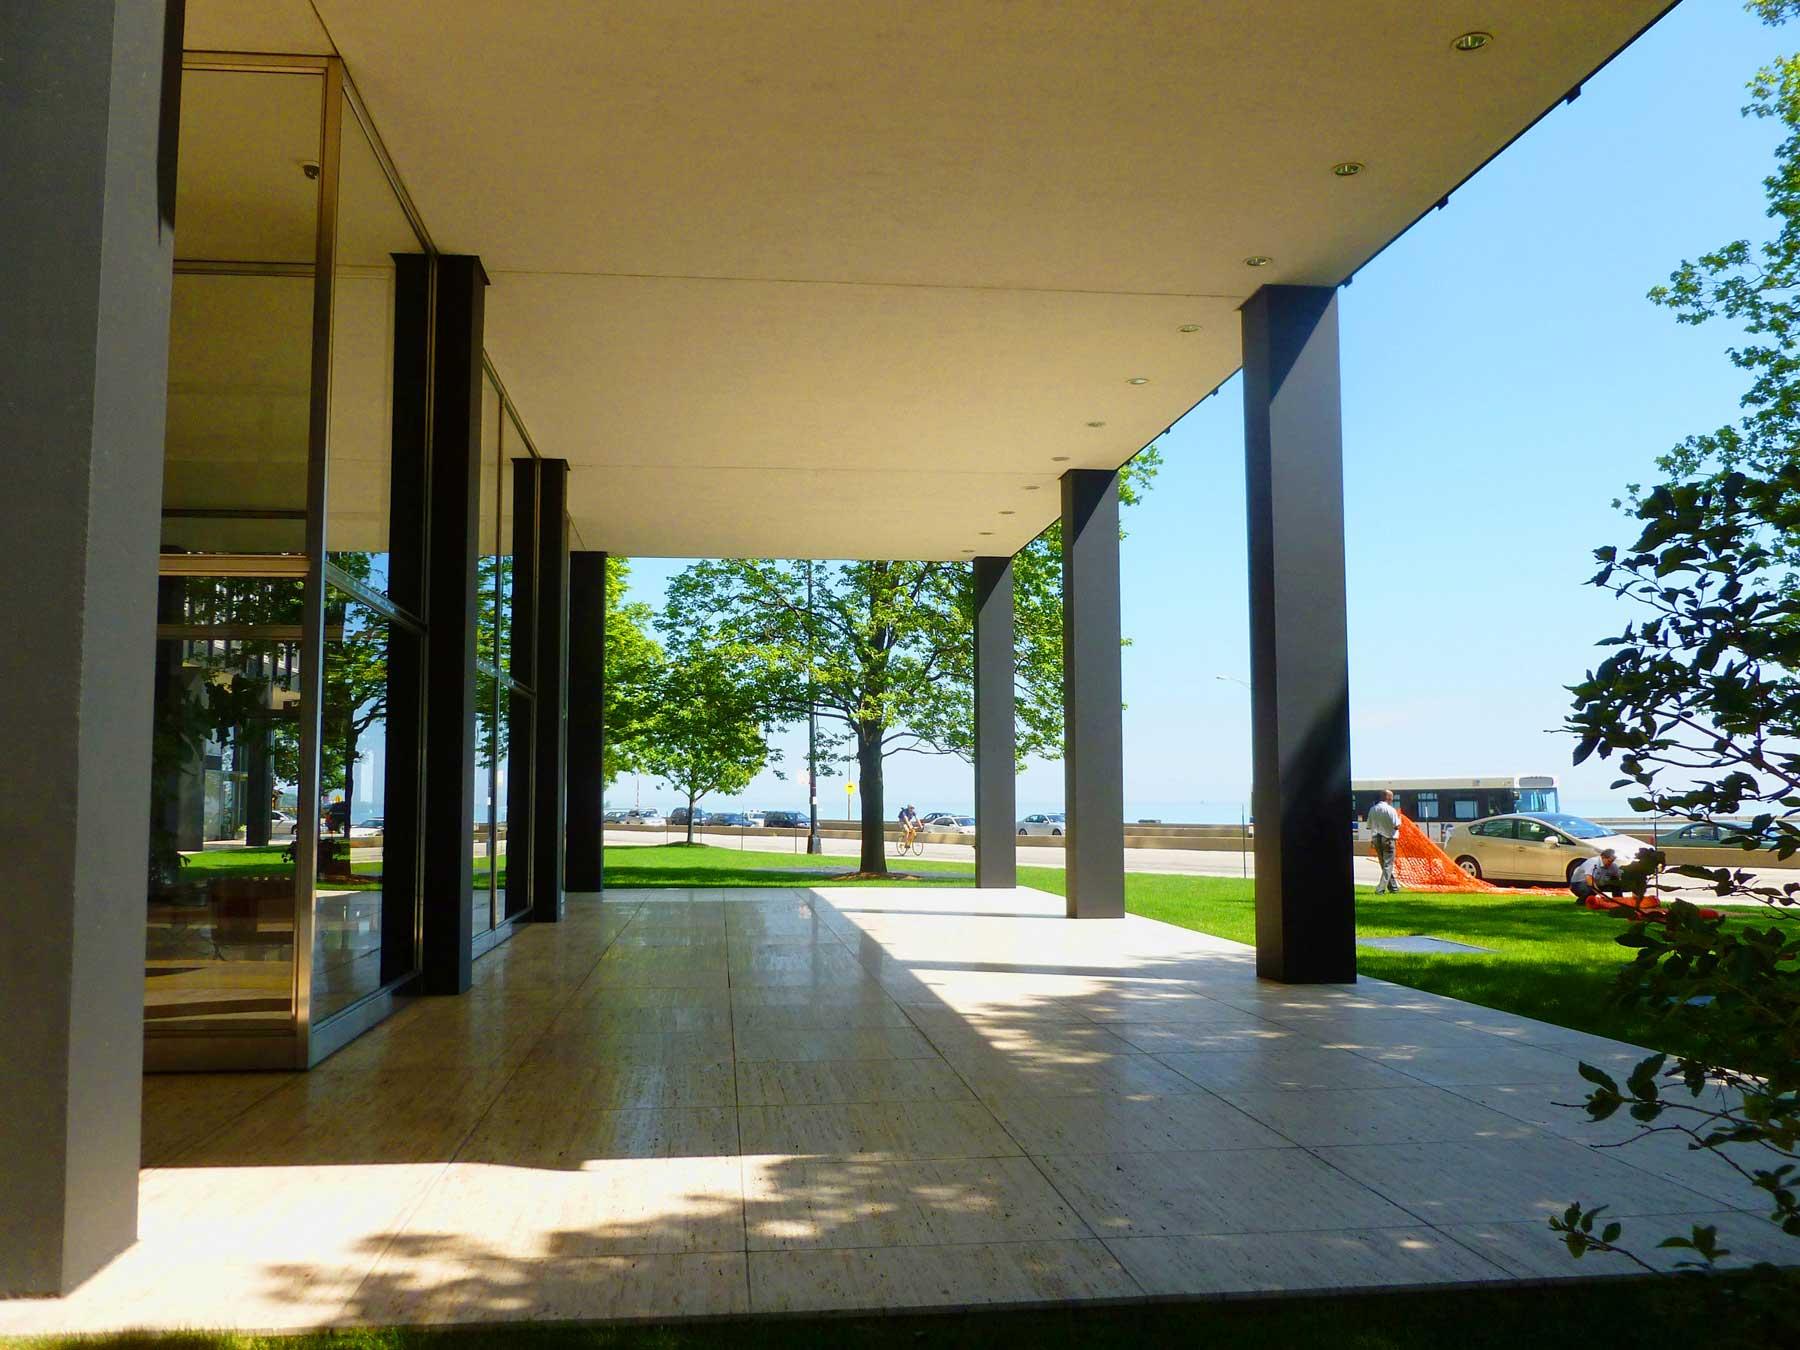 Home Design Story Cheats For Ipad 100 Simple Mies Van Der Rohe 517 Ludwig Mies Van